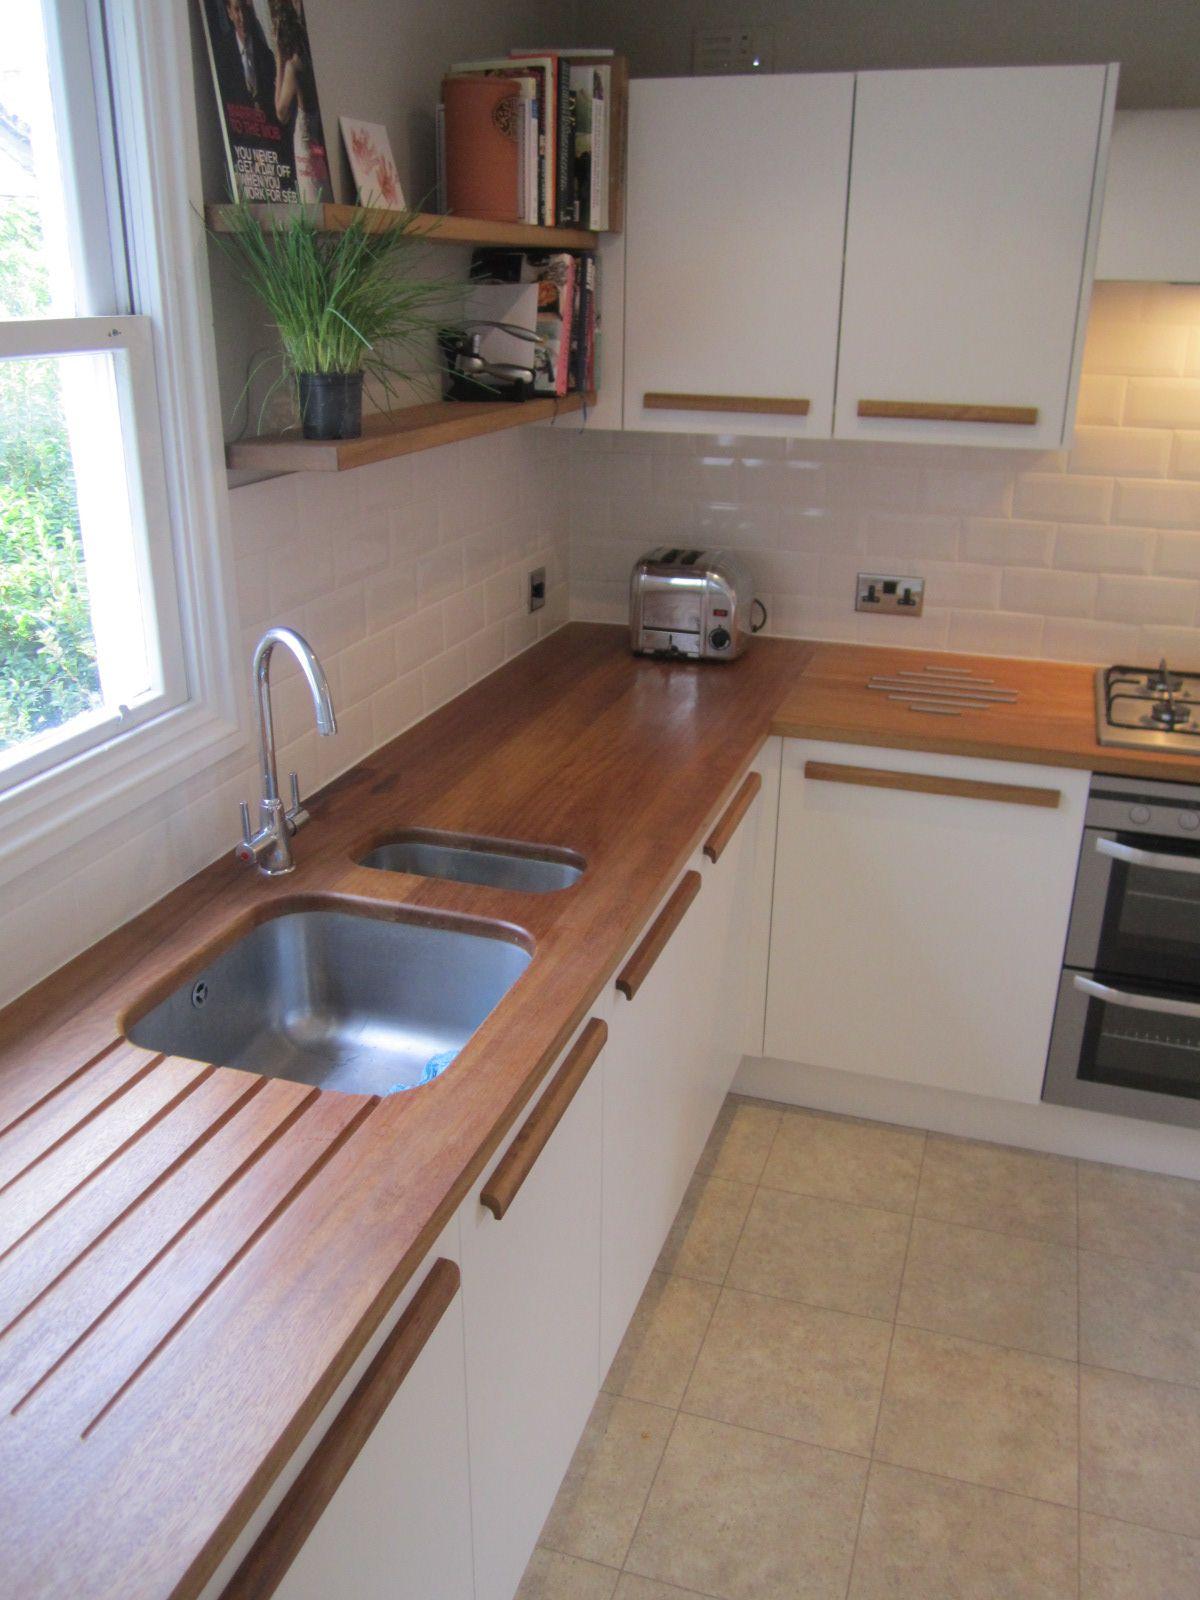 Kitchen Spray Painted Doors Solid Iroko Handles And Tops Kitchen Inspirations Kitchen Interior Kitchen